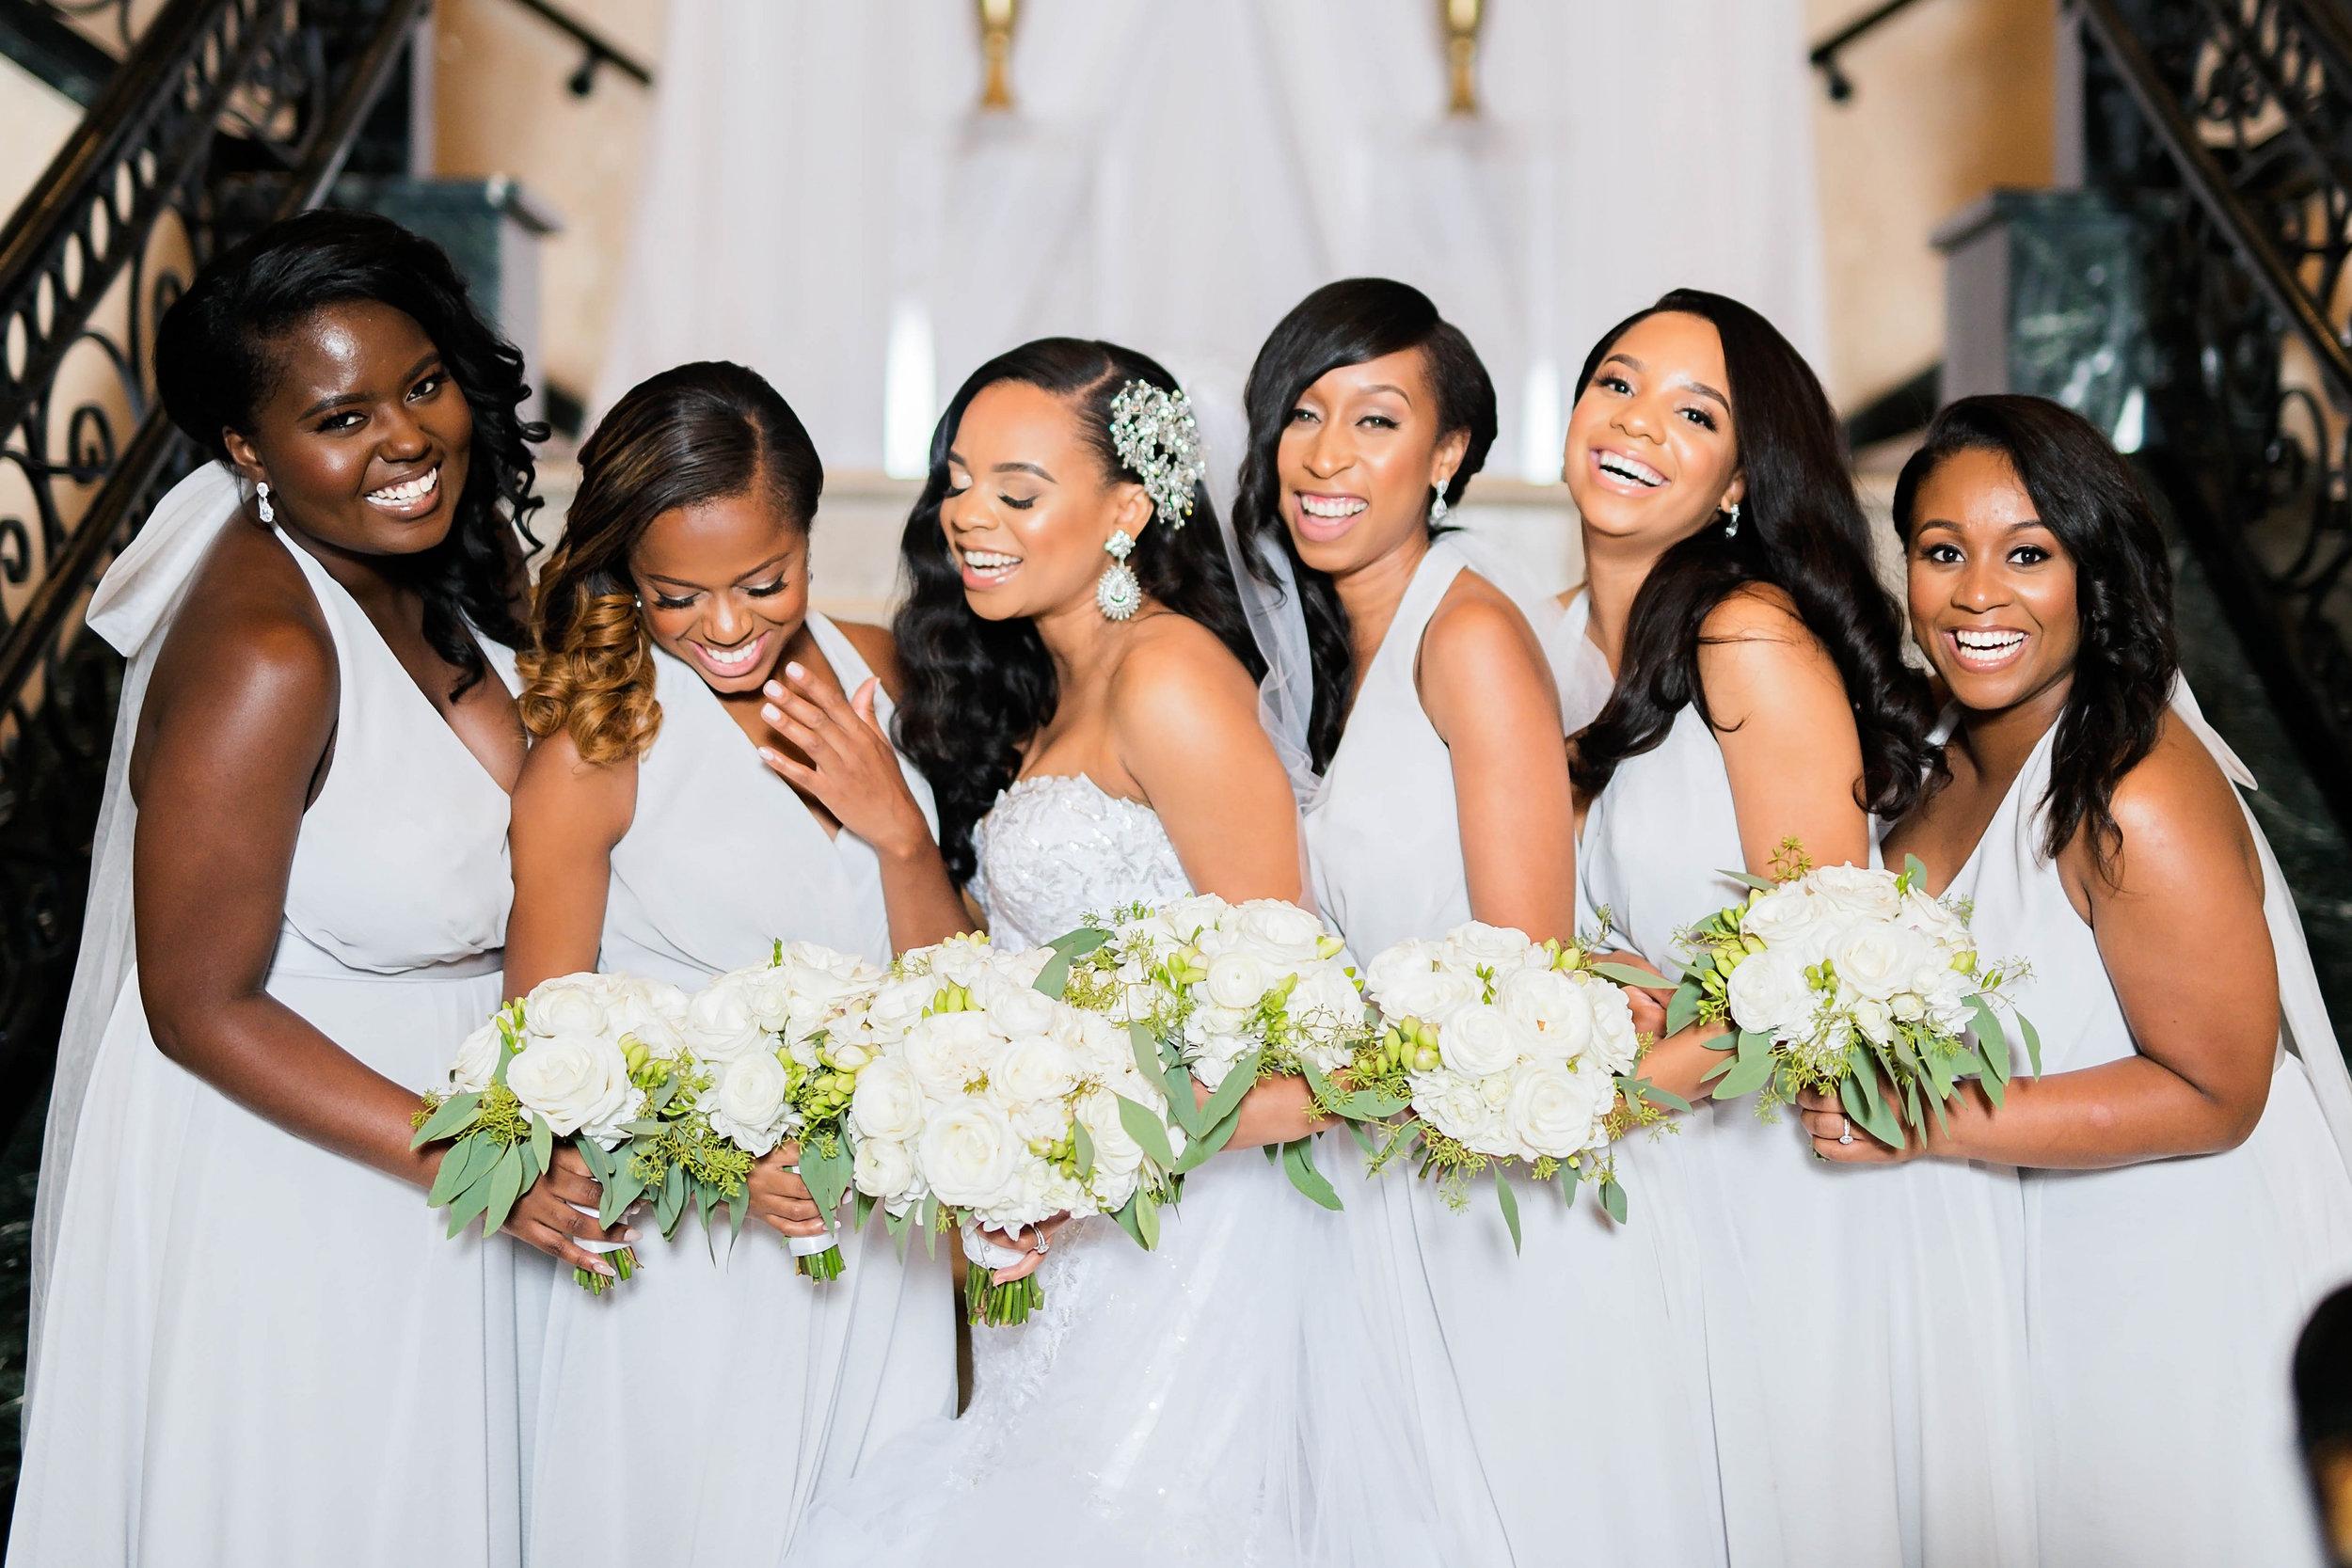 Tulsa Wedding- Pharris Photography- Darla + Quinton- Bridesmaids